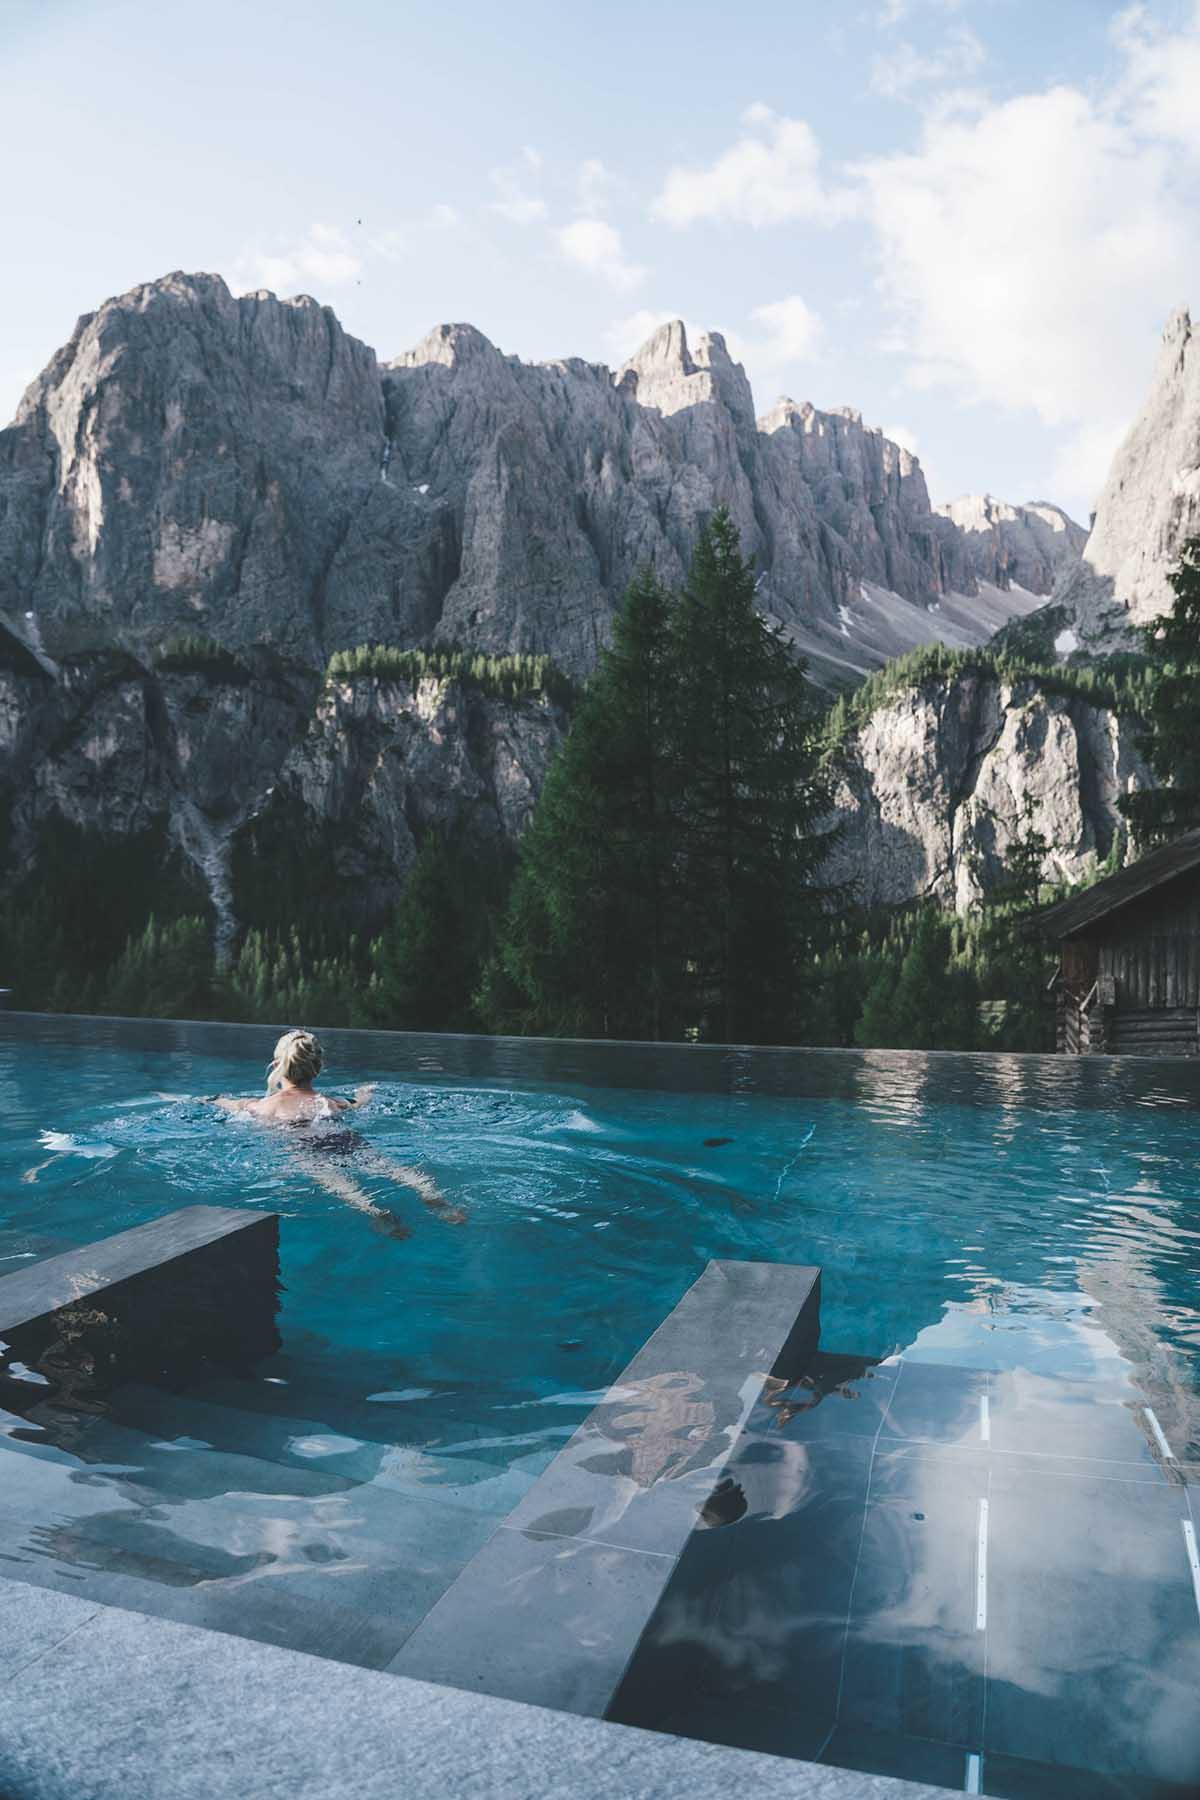 mountain-resort-kolfuschgerhof-dolomiten-frau-pool-01